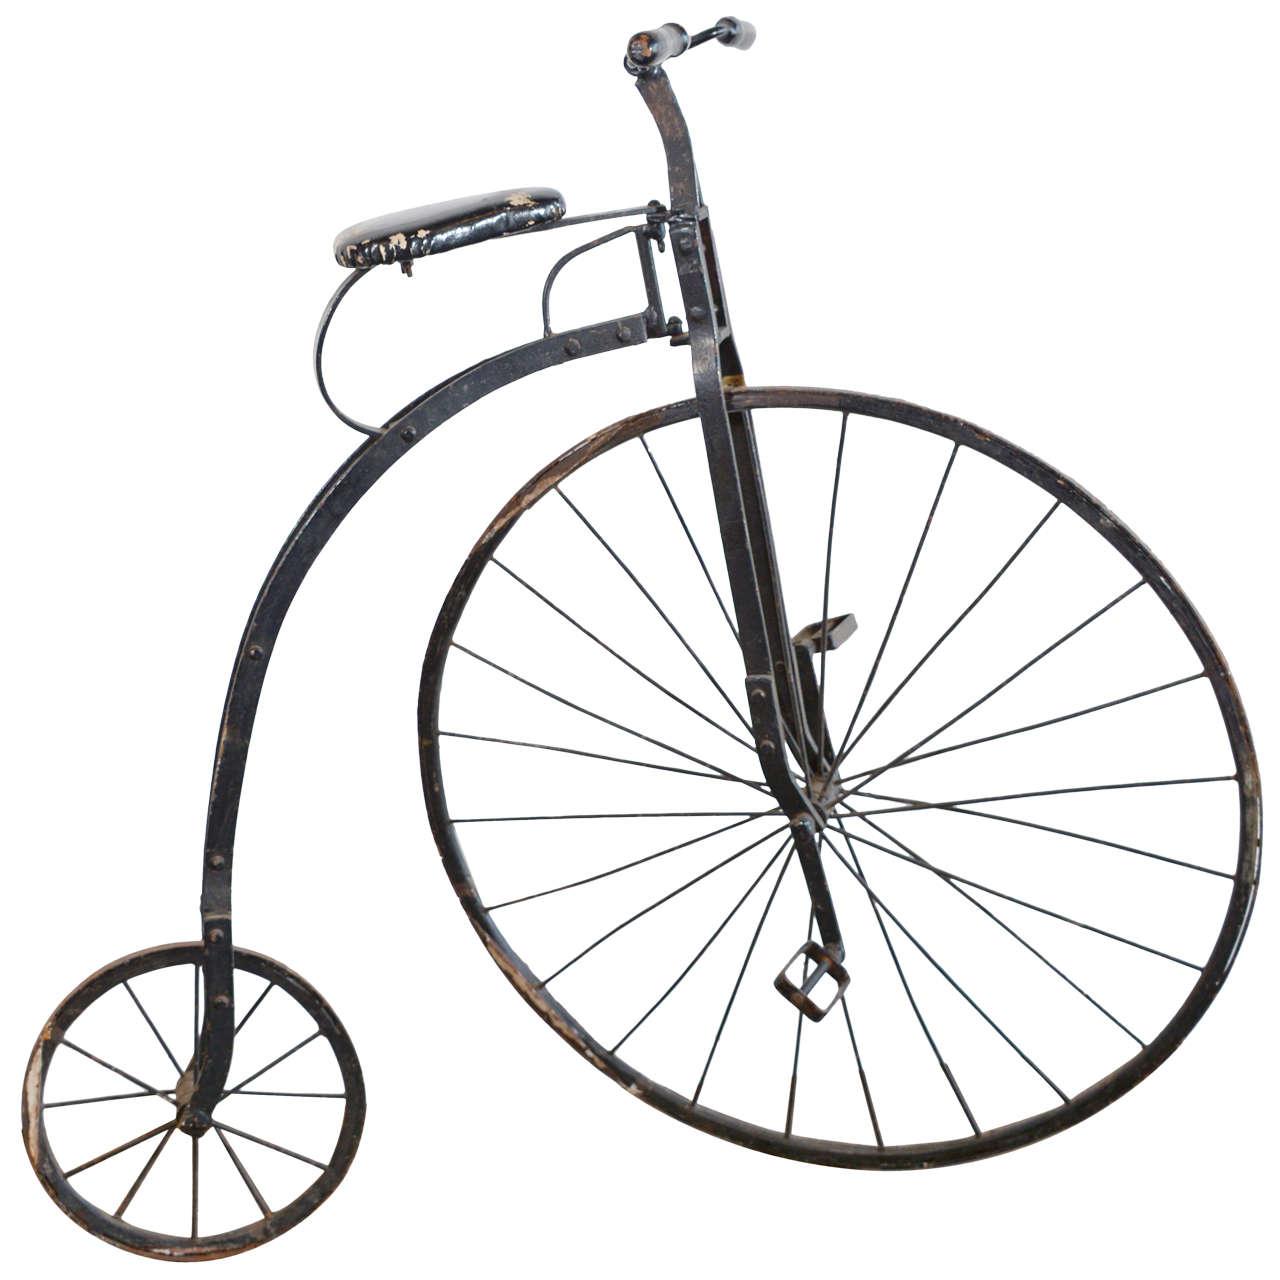 Antique English High Wheel Bicycle at 1stdibs